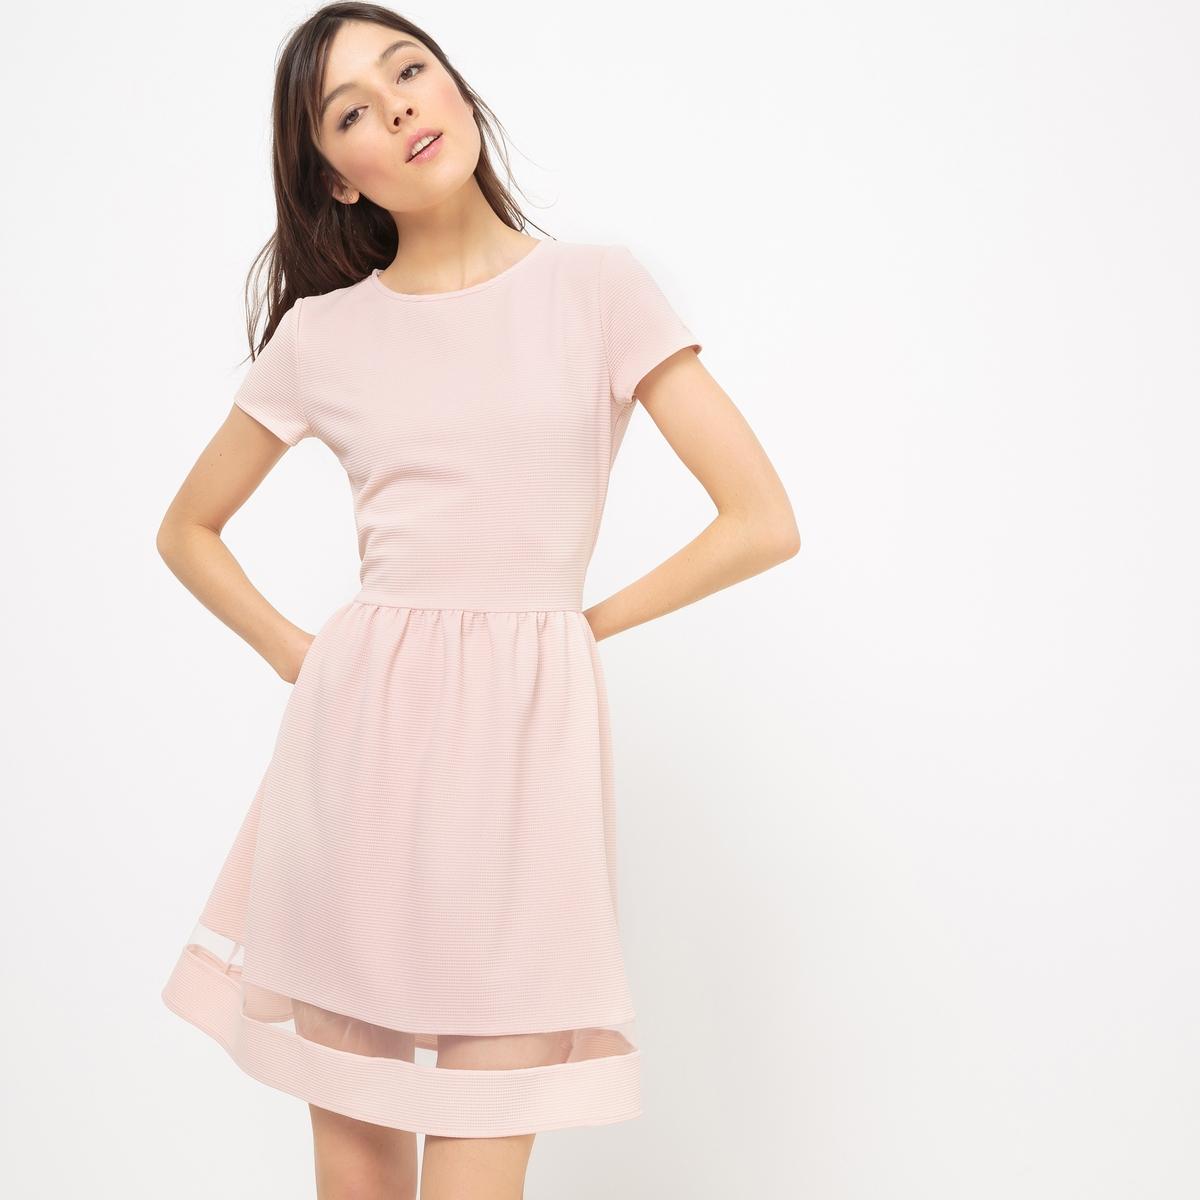 Sukienka rozkloszowana, transparentny pasek na dole